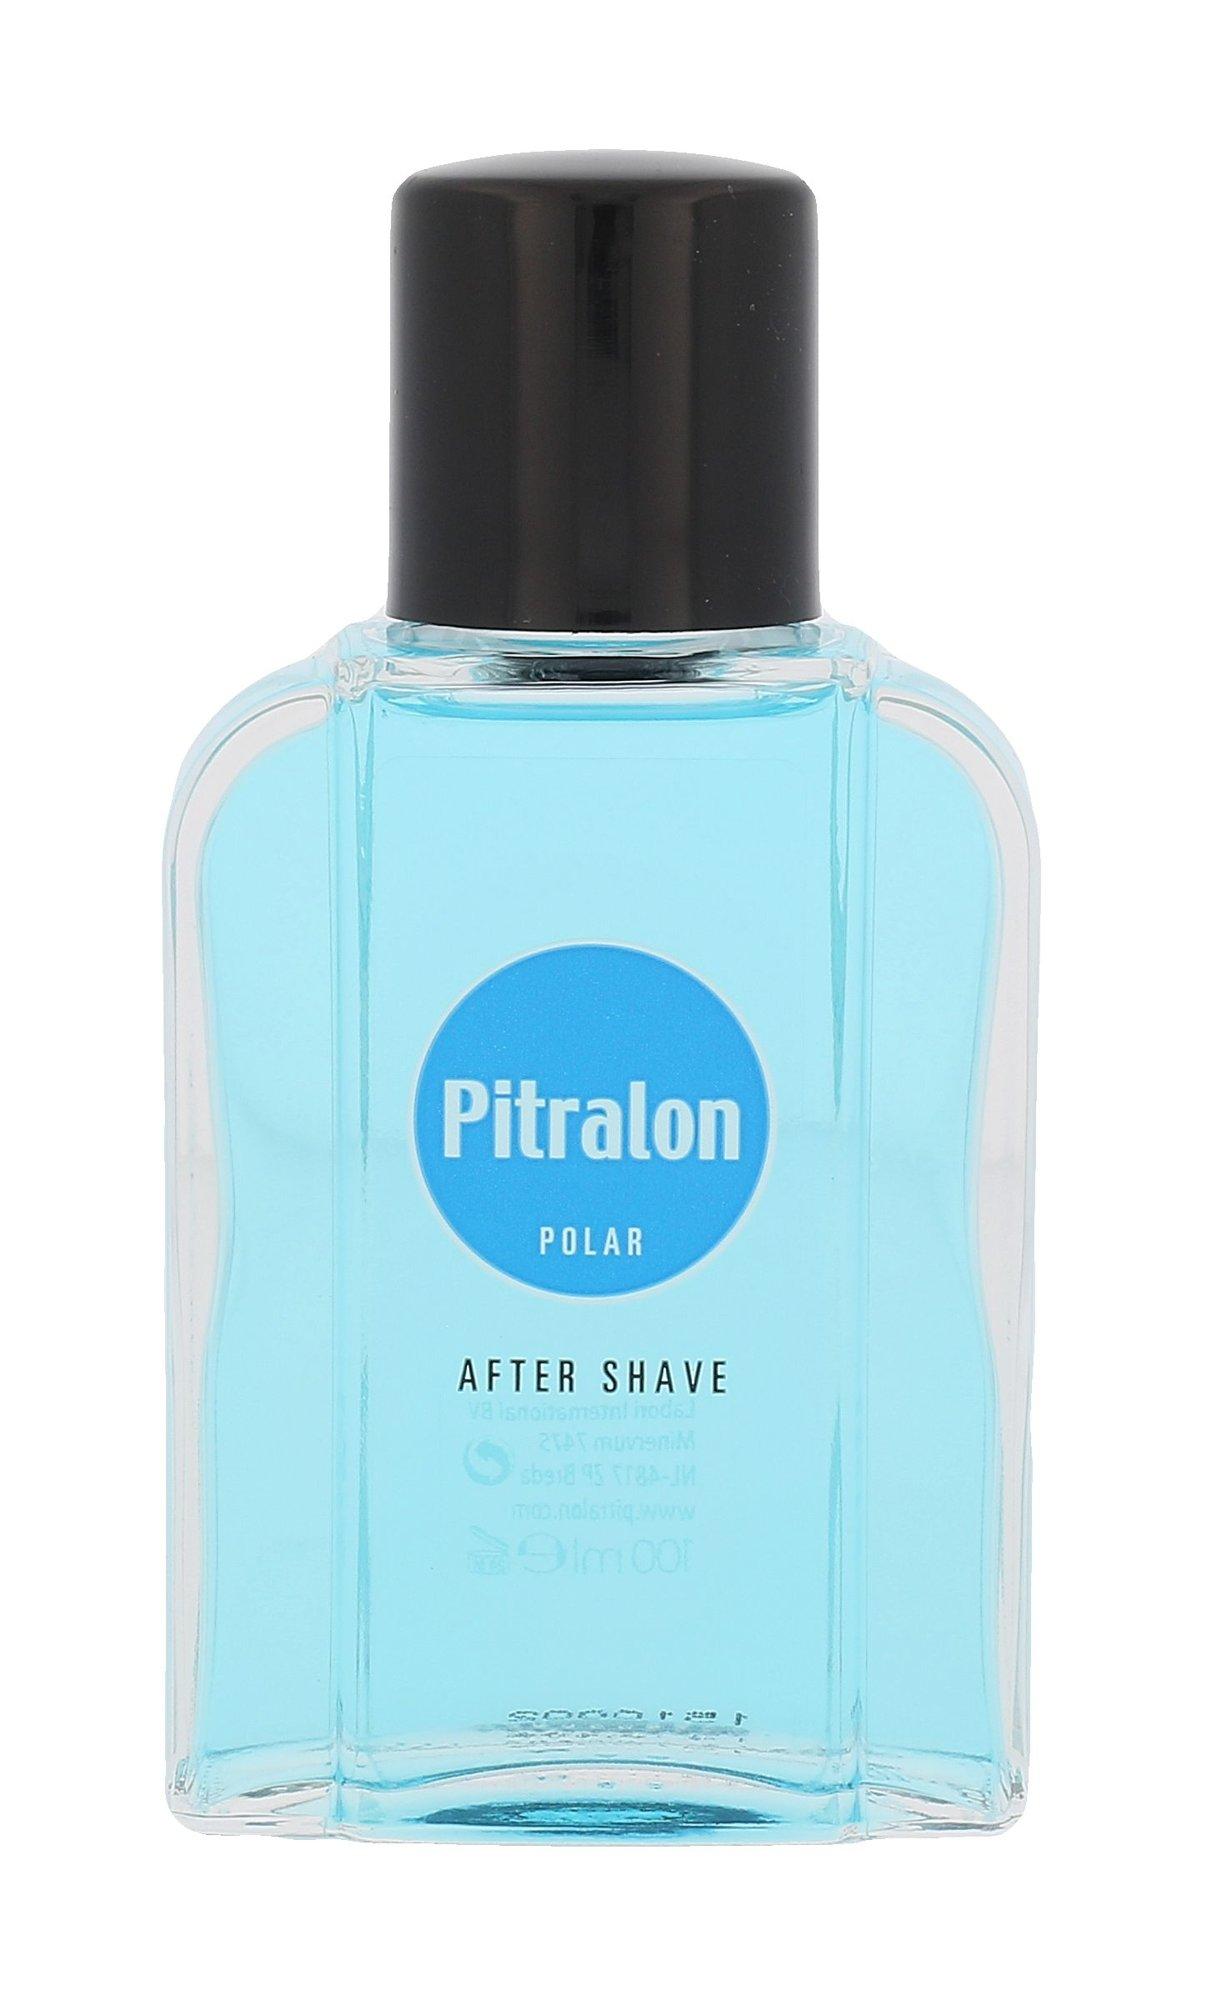 Pitralon Polar Aftershave 100ml